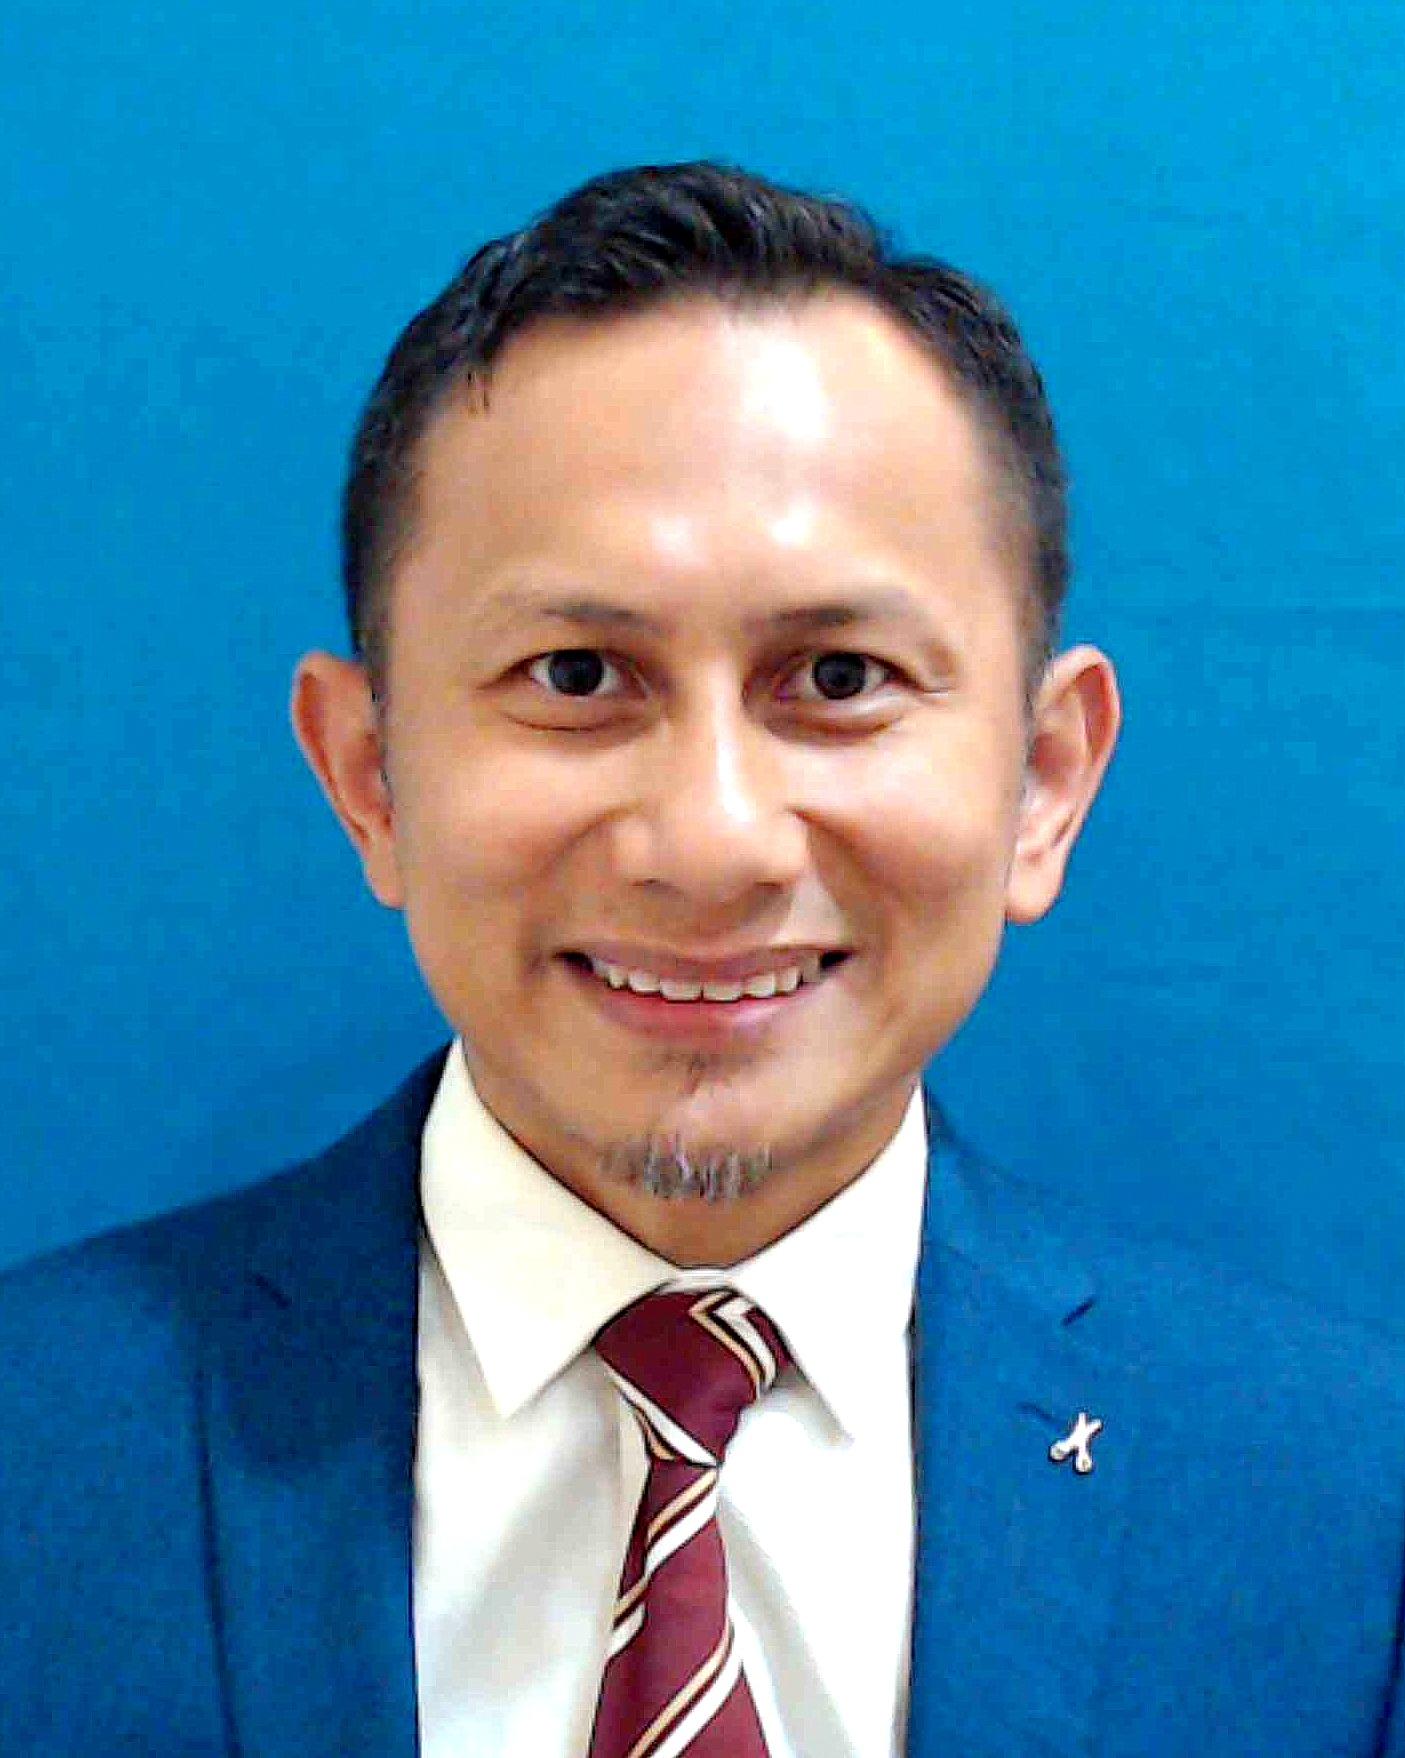 Md Muziman Syah Bin Md Mustafa